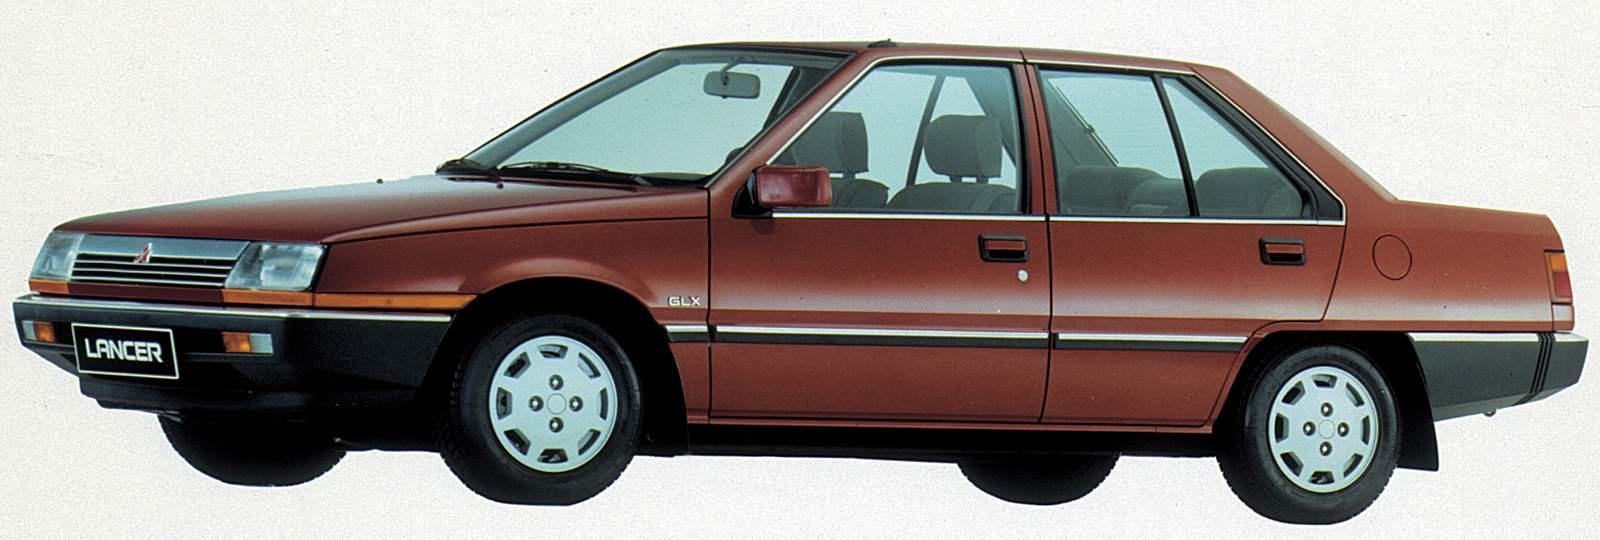 Mitsubishi Lancer of the fourth generation (1983)